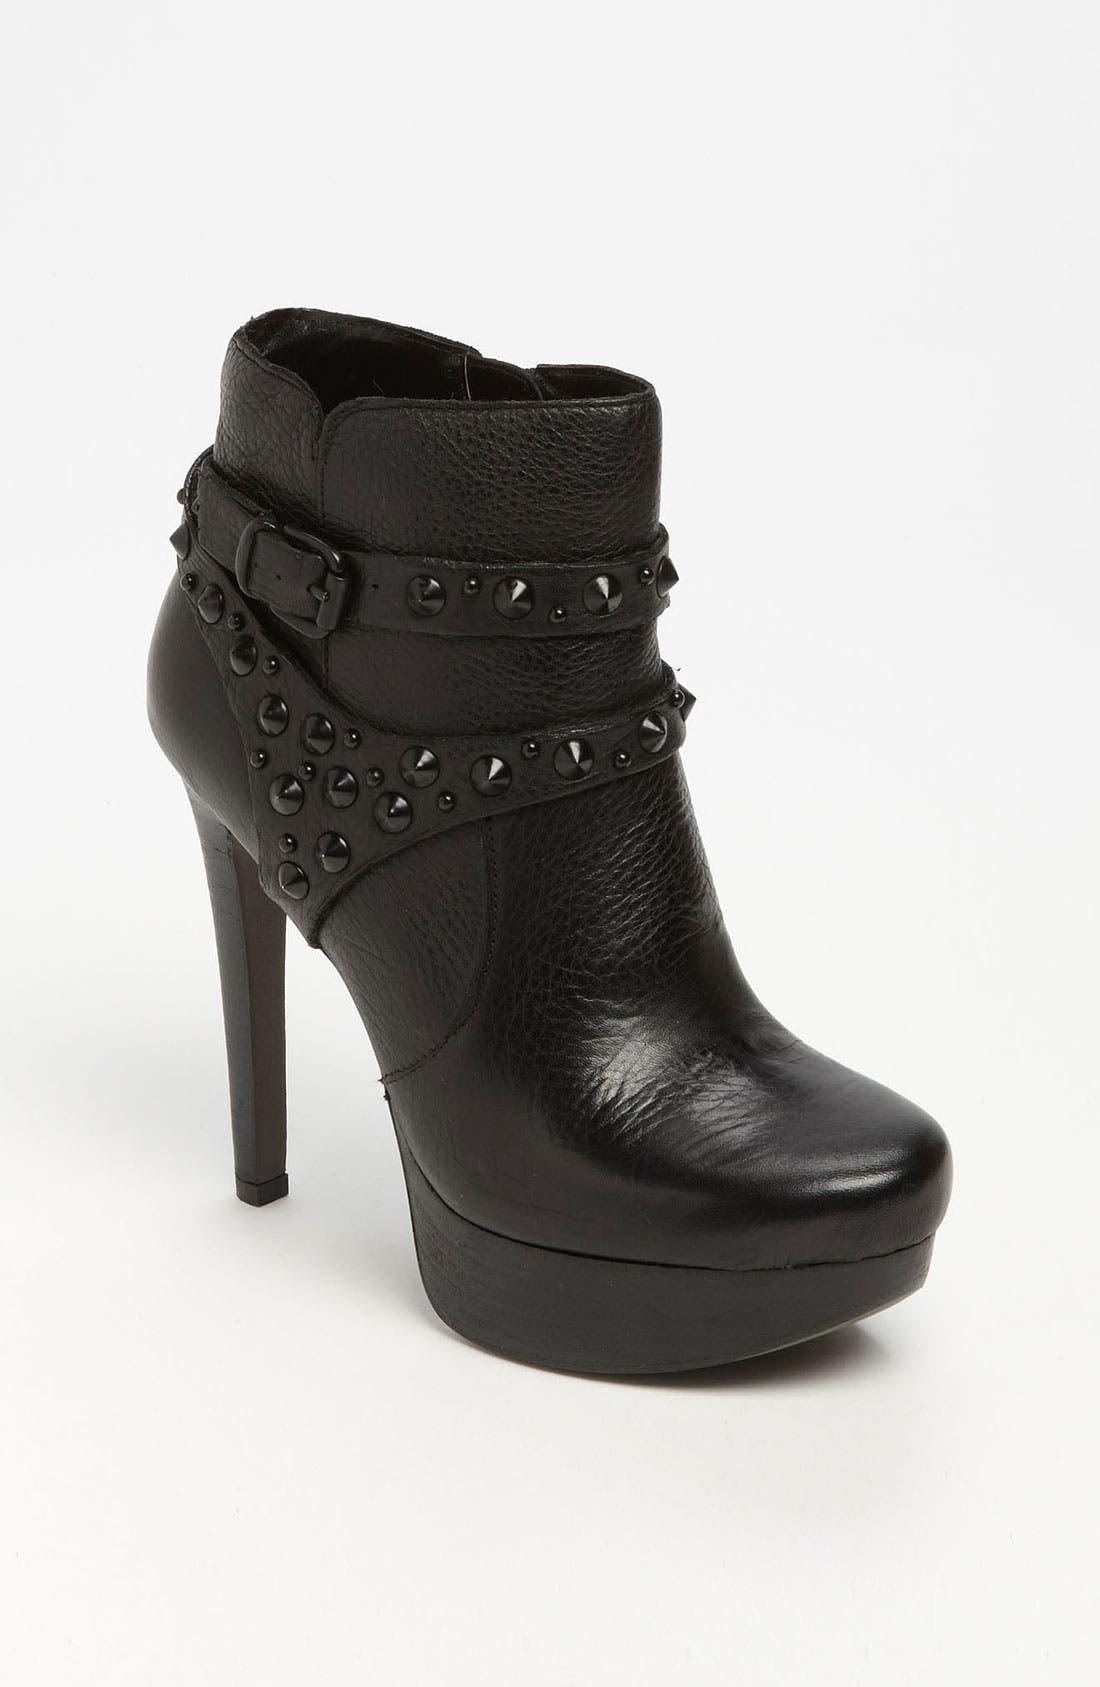 Alternate Image 1 Selected - Fergie 'Latta' Boot